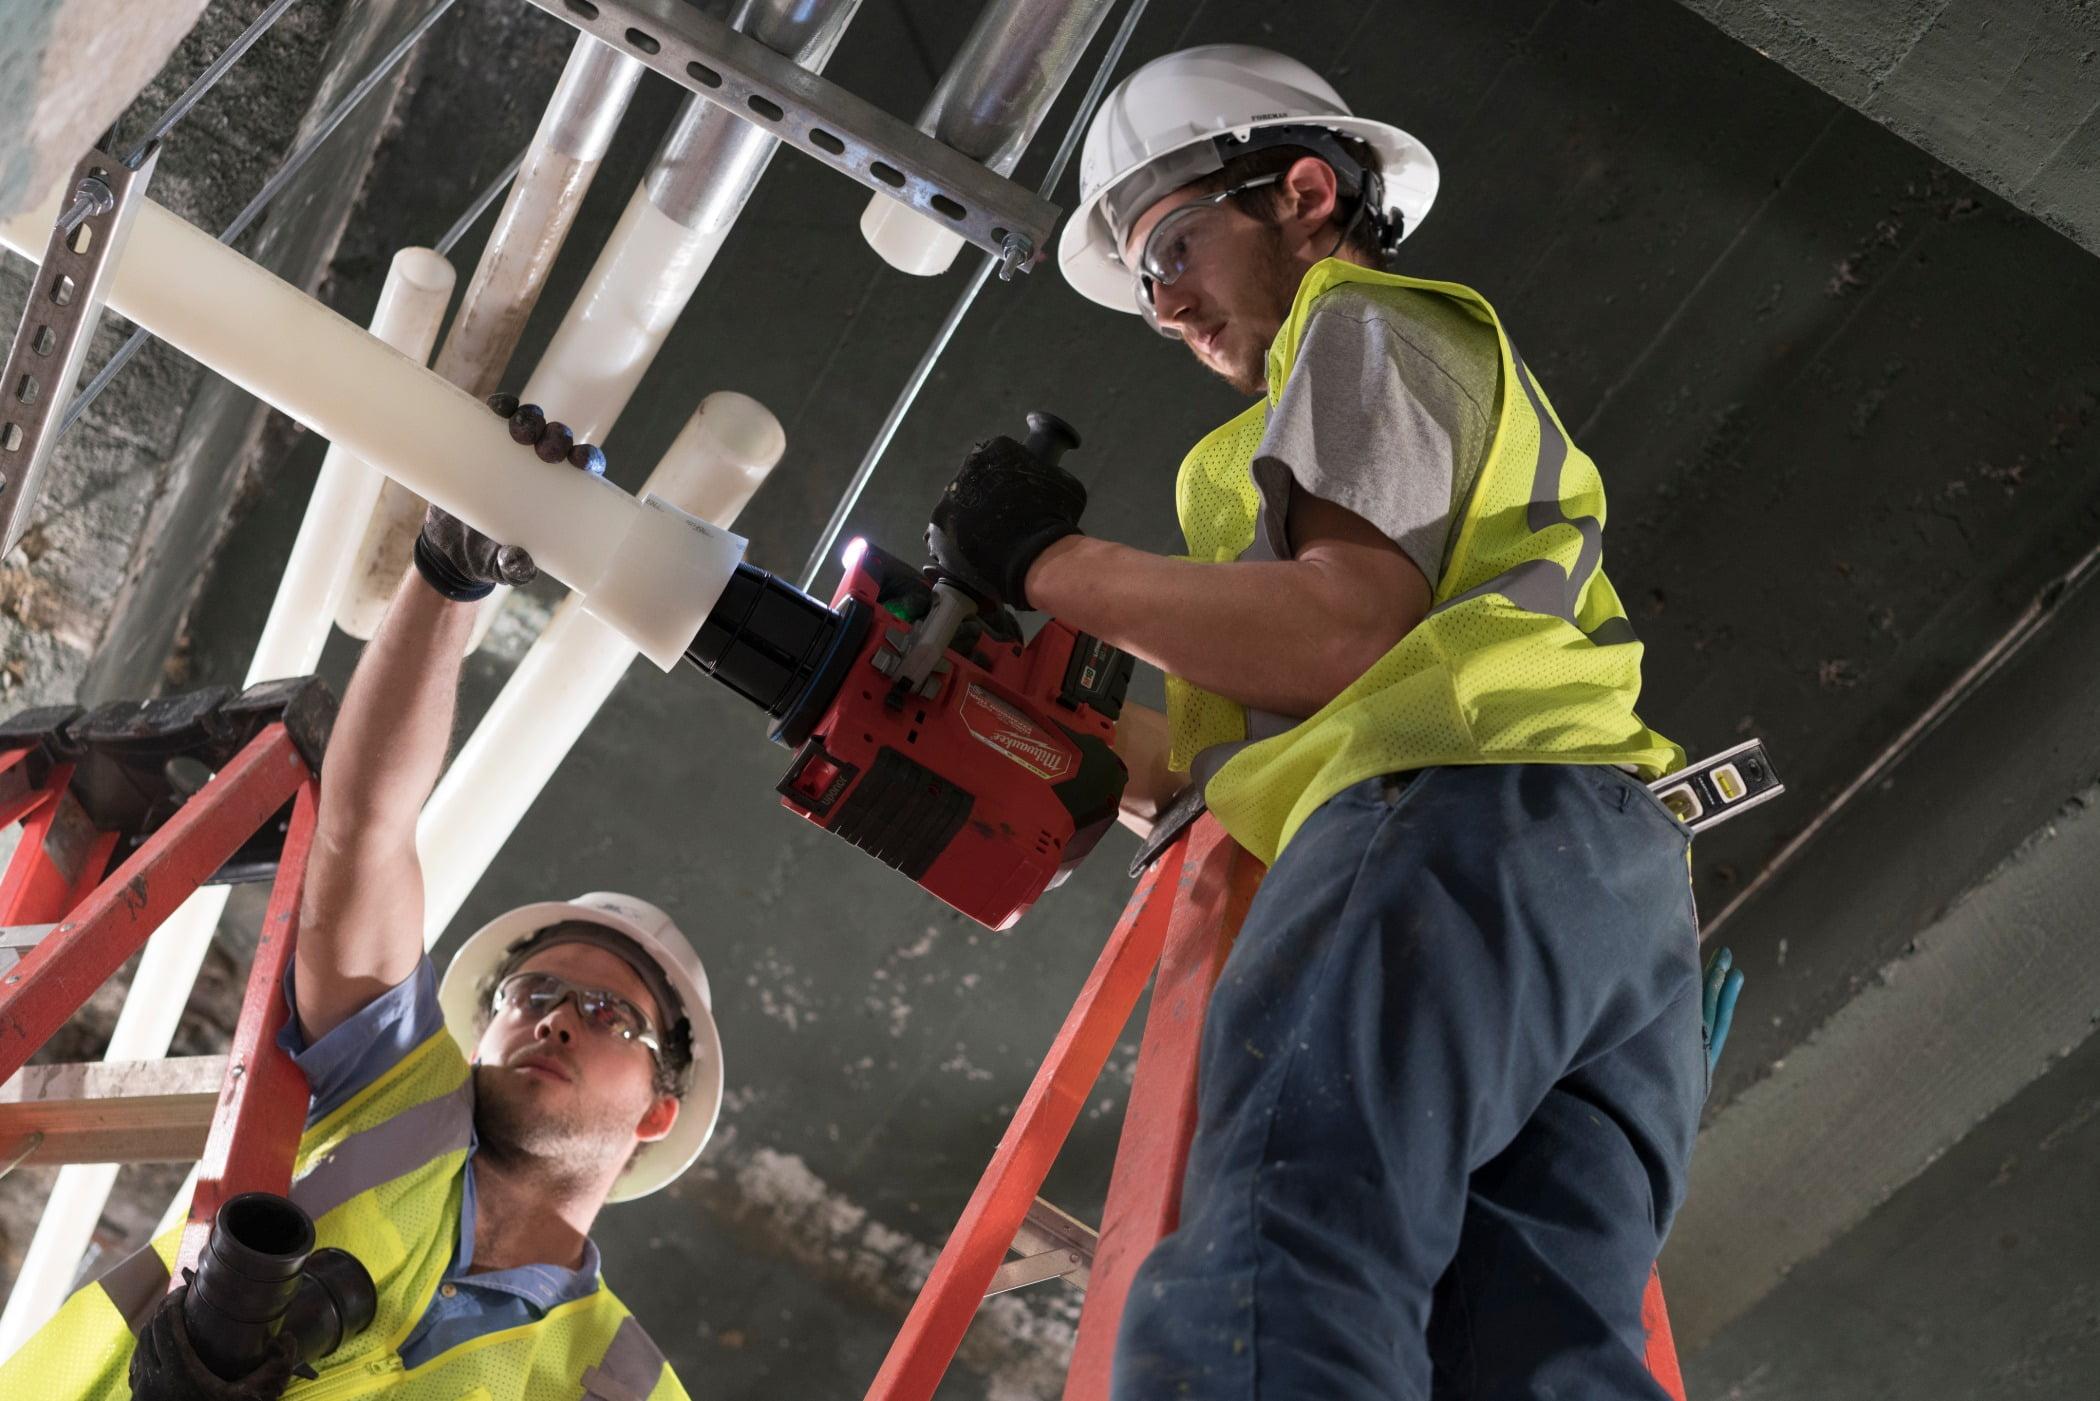 Personal protective equipment, Blue-collar worker, Employment, Tradesman, Engineering, Service, Job, Helmet, Workwear